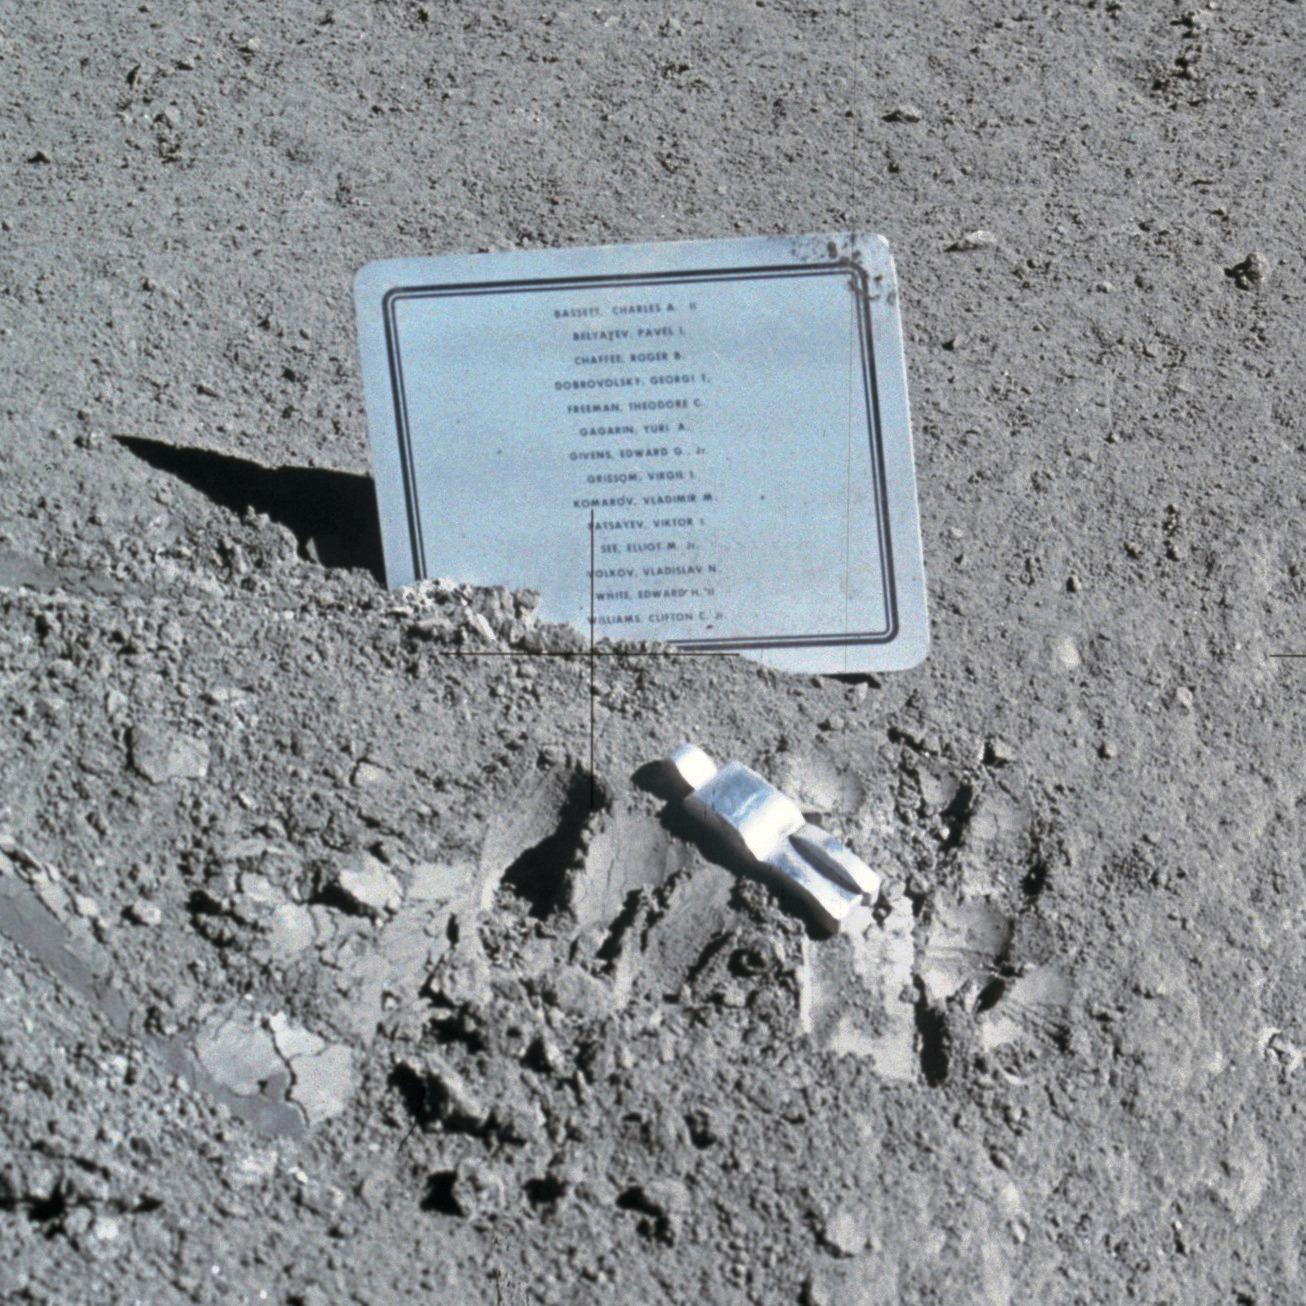 Fallen_Astronaut